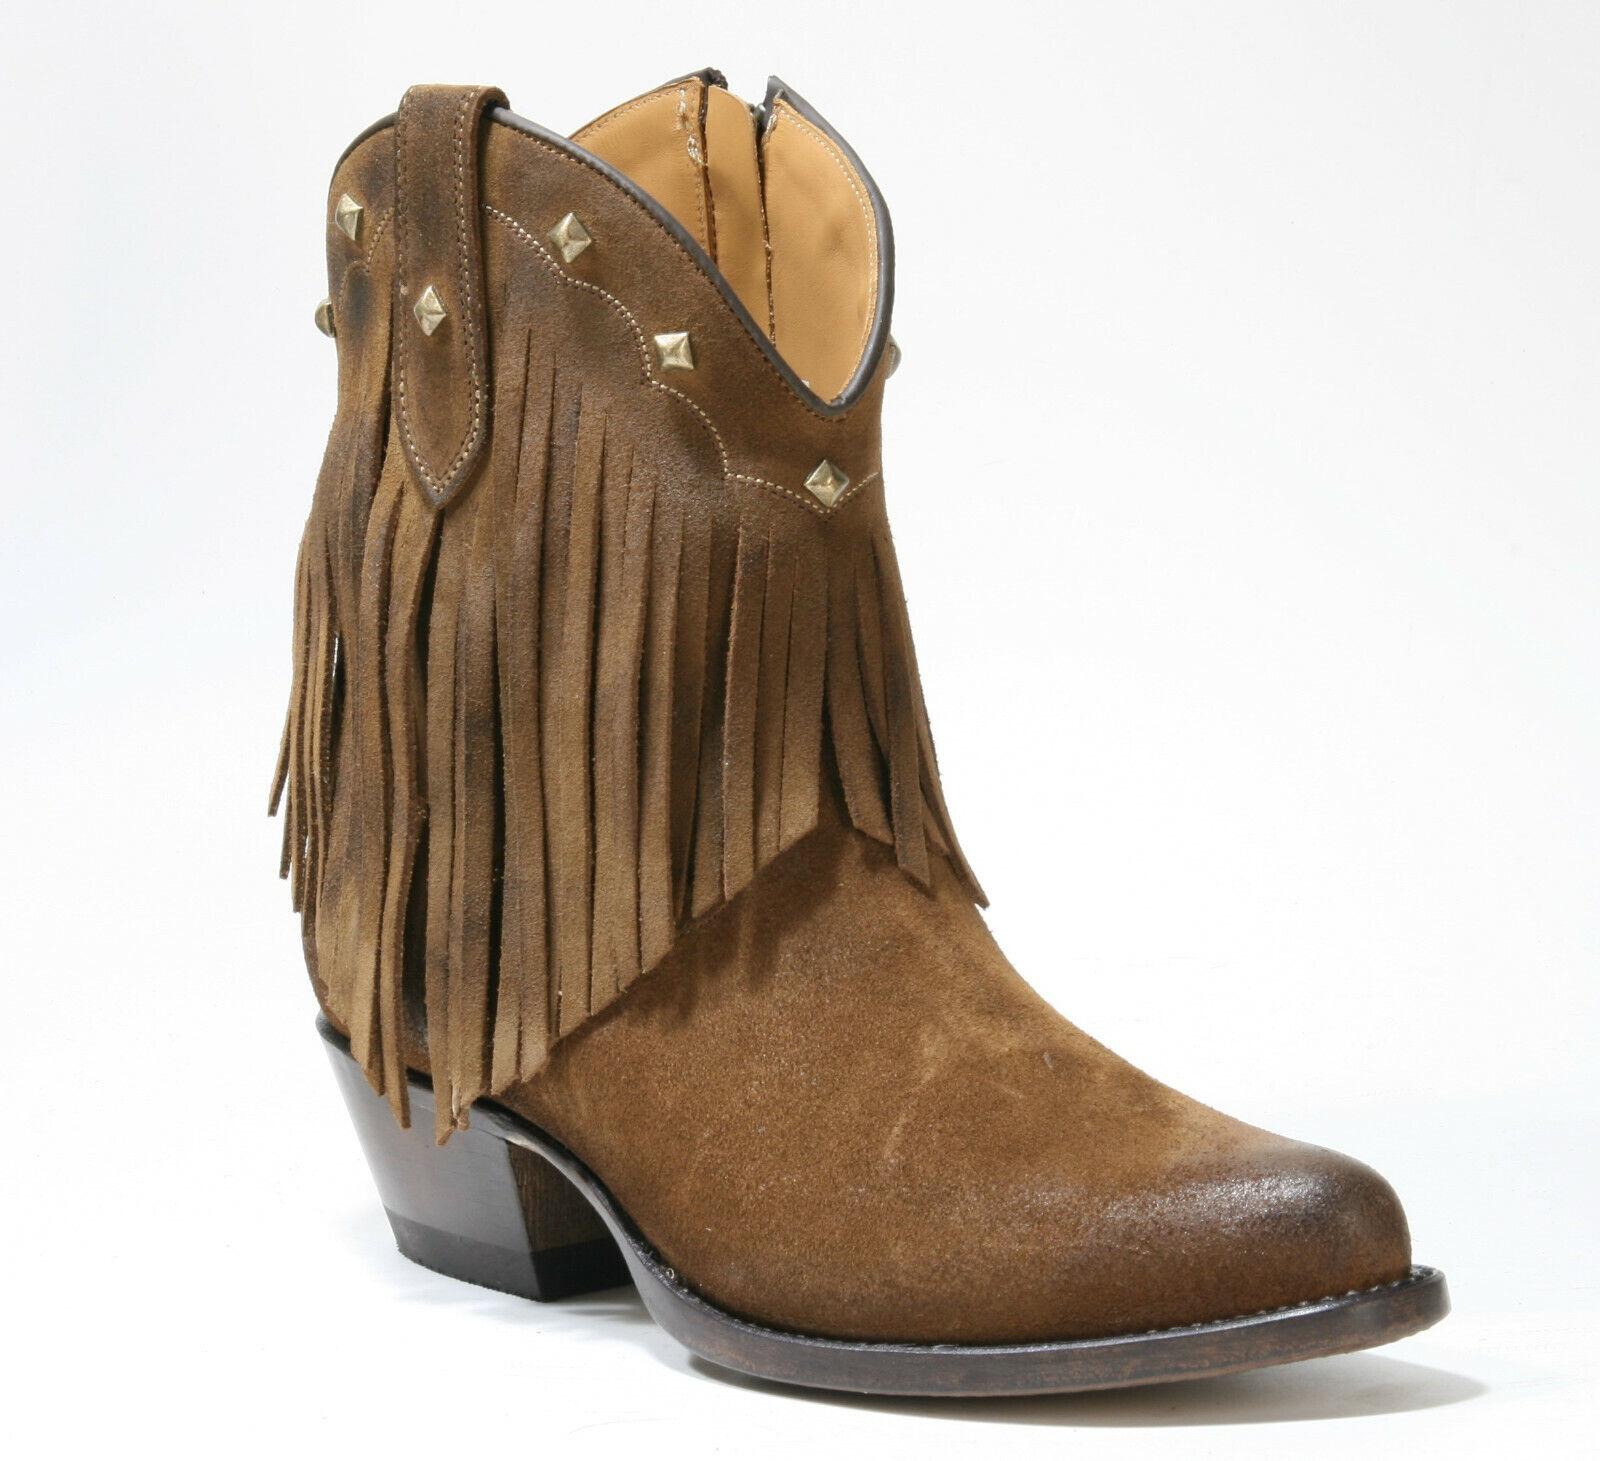 2374 Mayura flecos botas Atenea marrón tabaco botas de vaquero